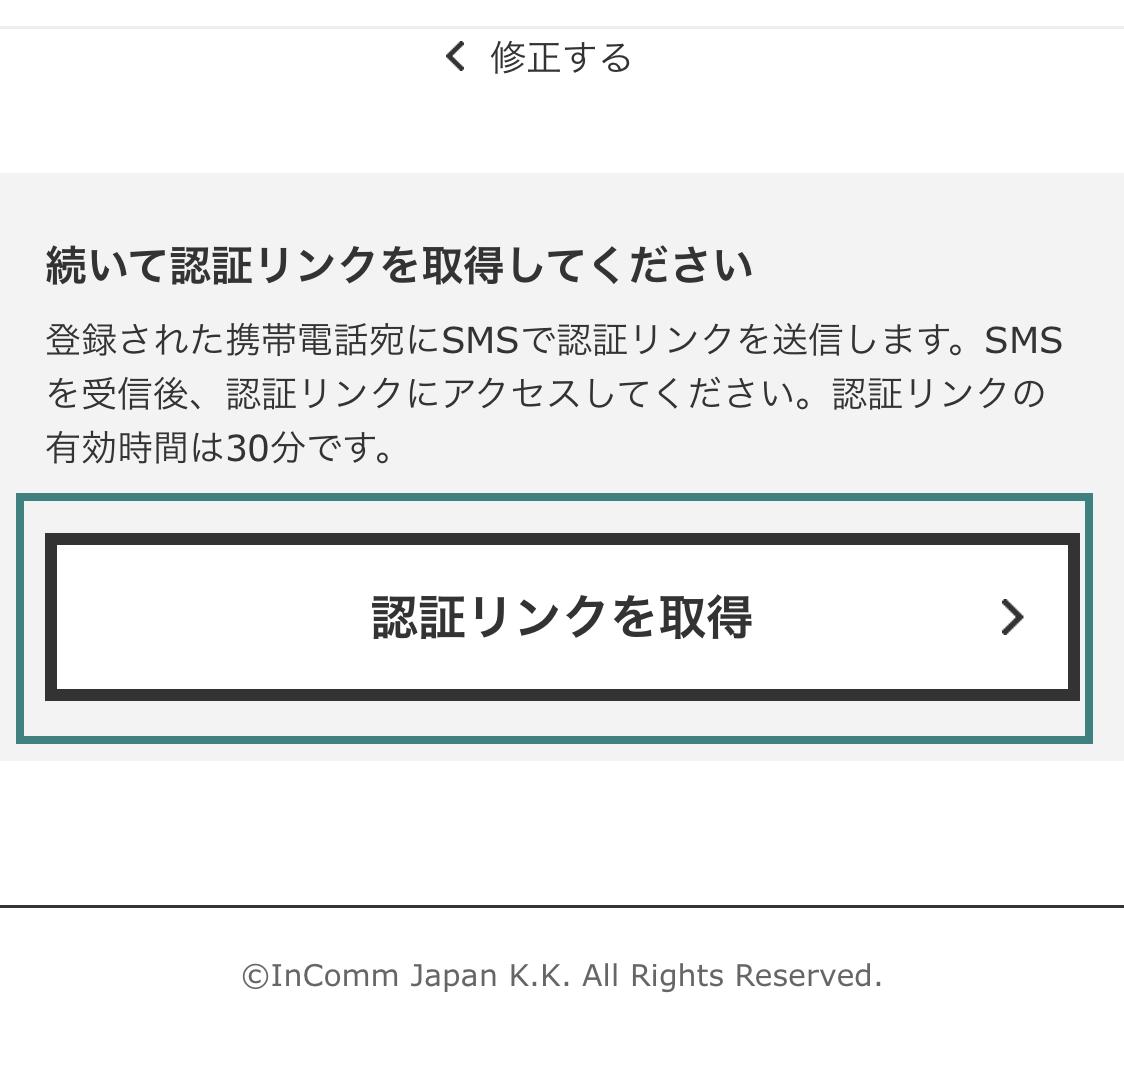 f:id:Sabuaka:20190314011612p:plain